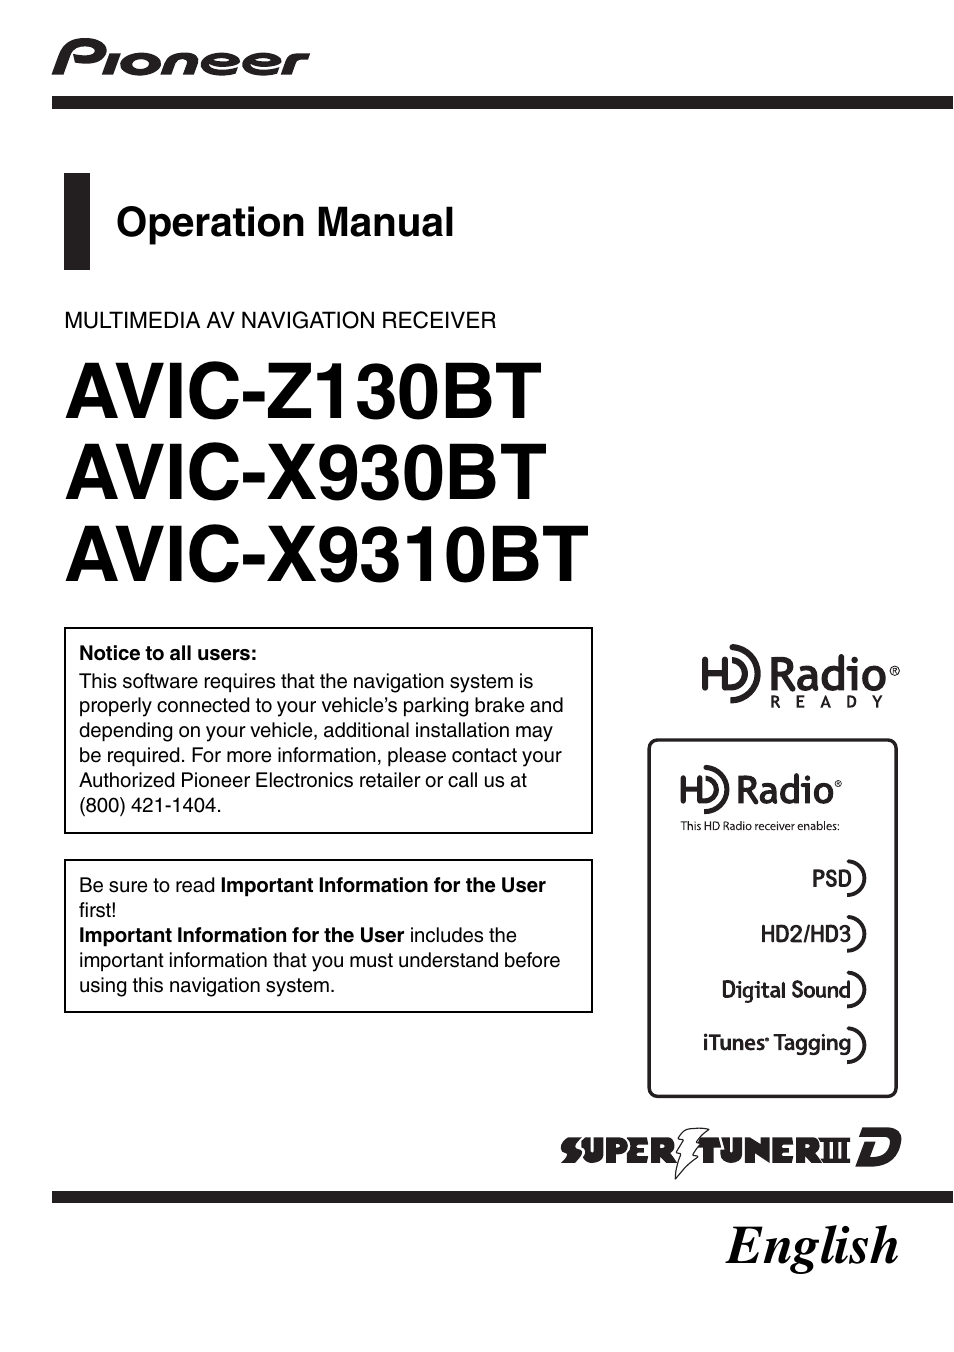 pioneer super tuner iiid avic x9310bt user manual 232 pages also rh manualsdir com Pioneer AVIC-Z130BT Inputs operation manual for pioneer avic-z130bt